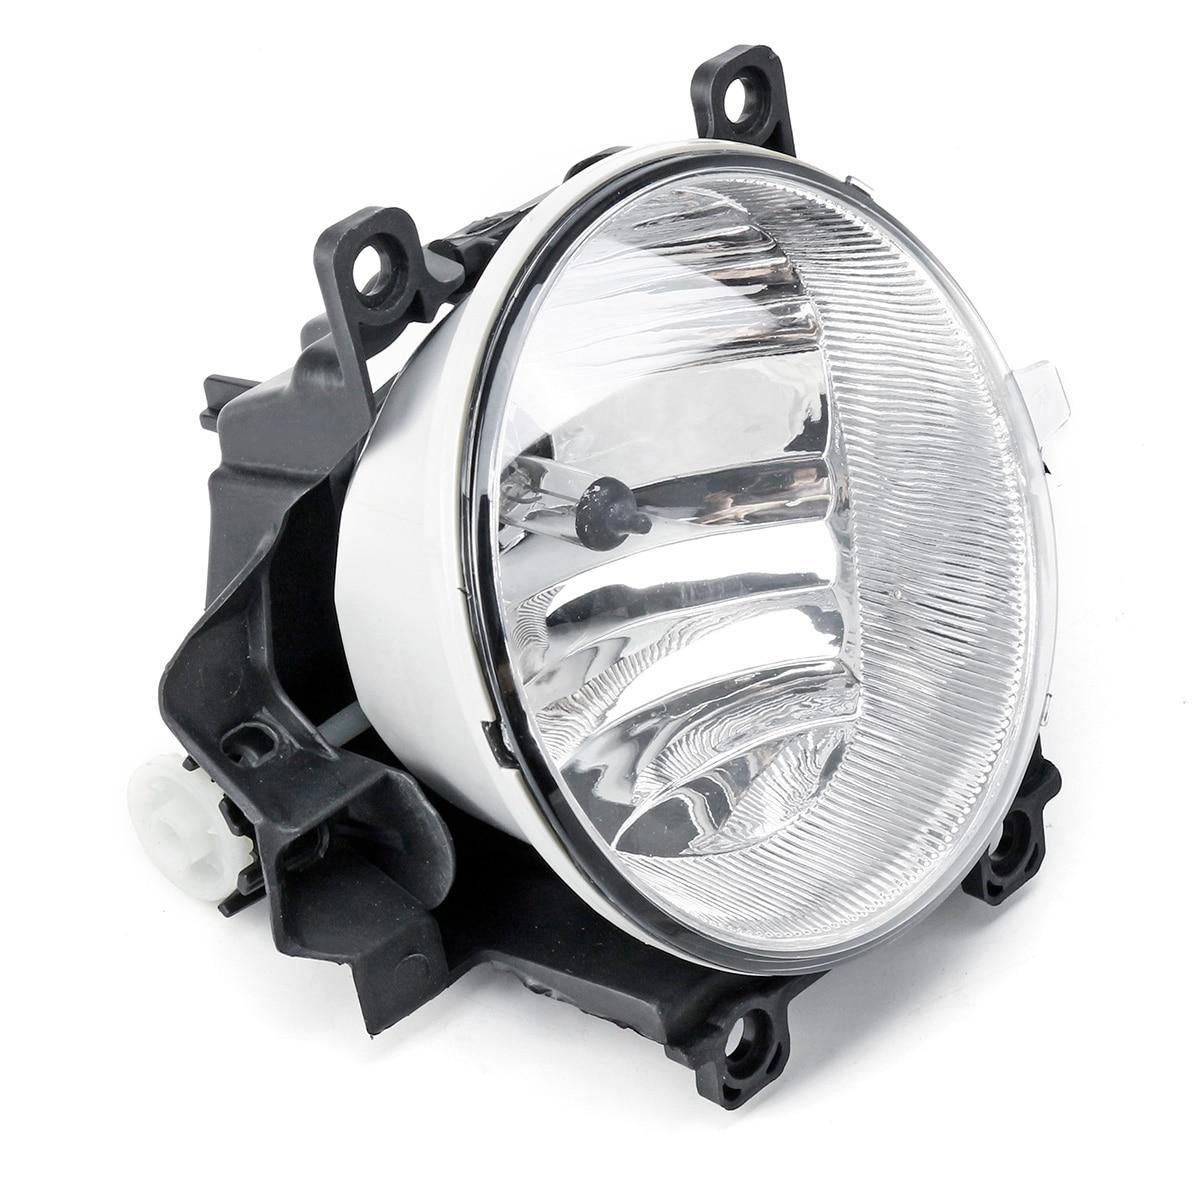 Ajustes de Toyota RAV4 MK3 2.2 D-Gato Blanco 54-SMD LED 12v Bombillas De Luz Lateral De Estacionamiento